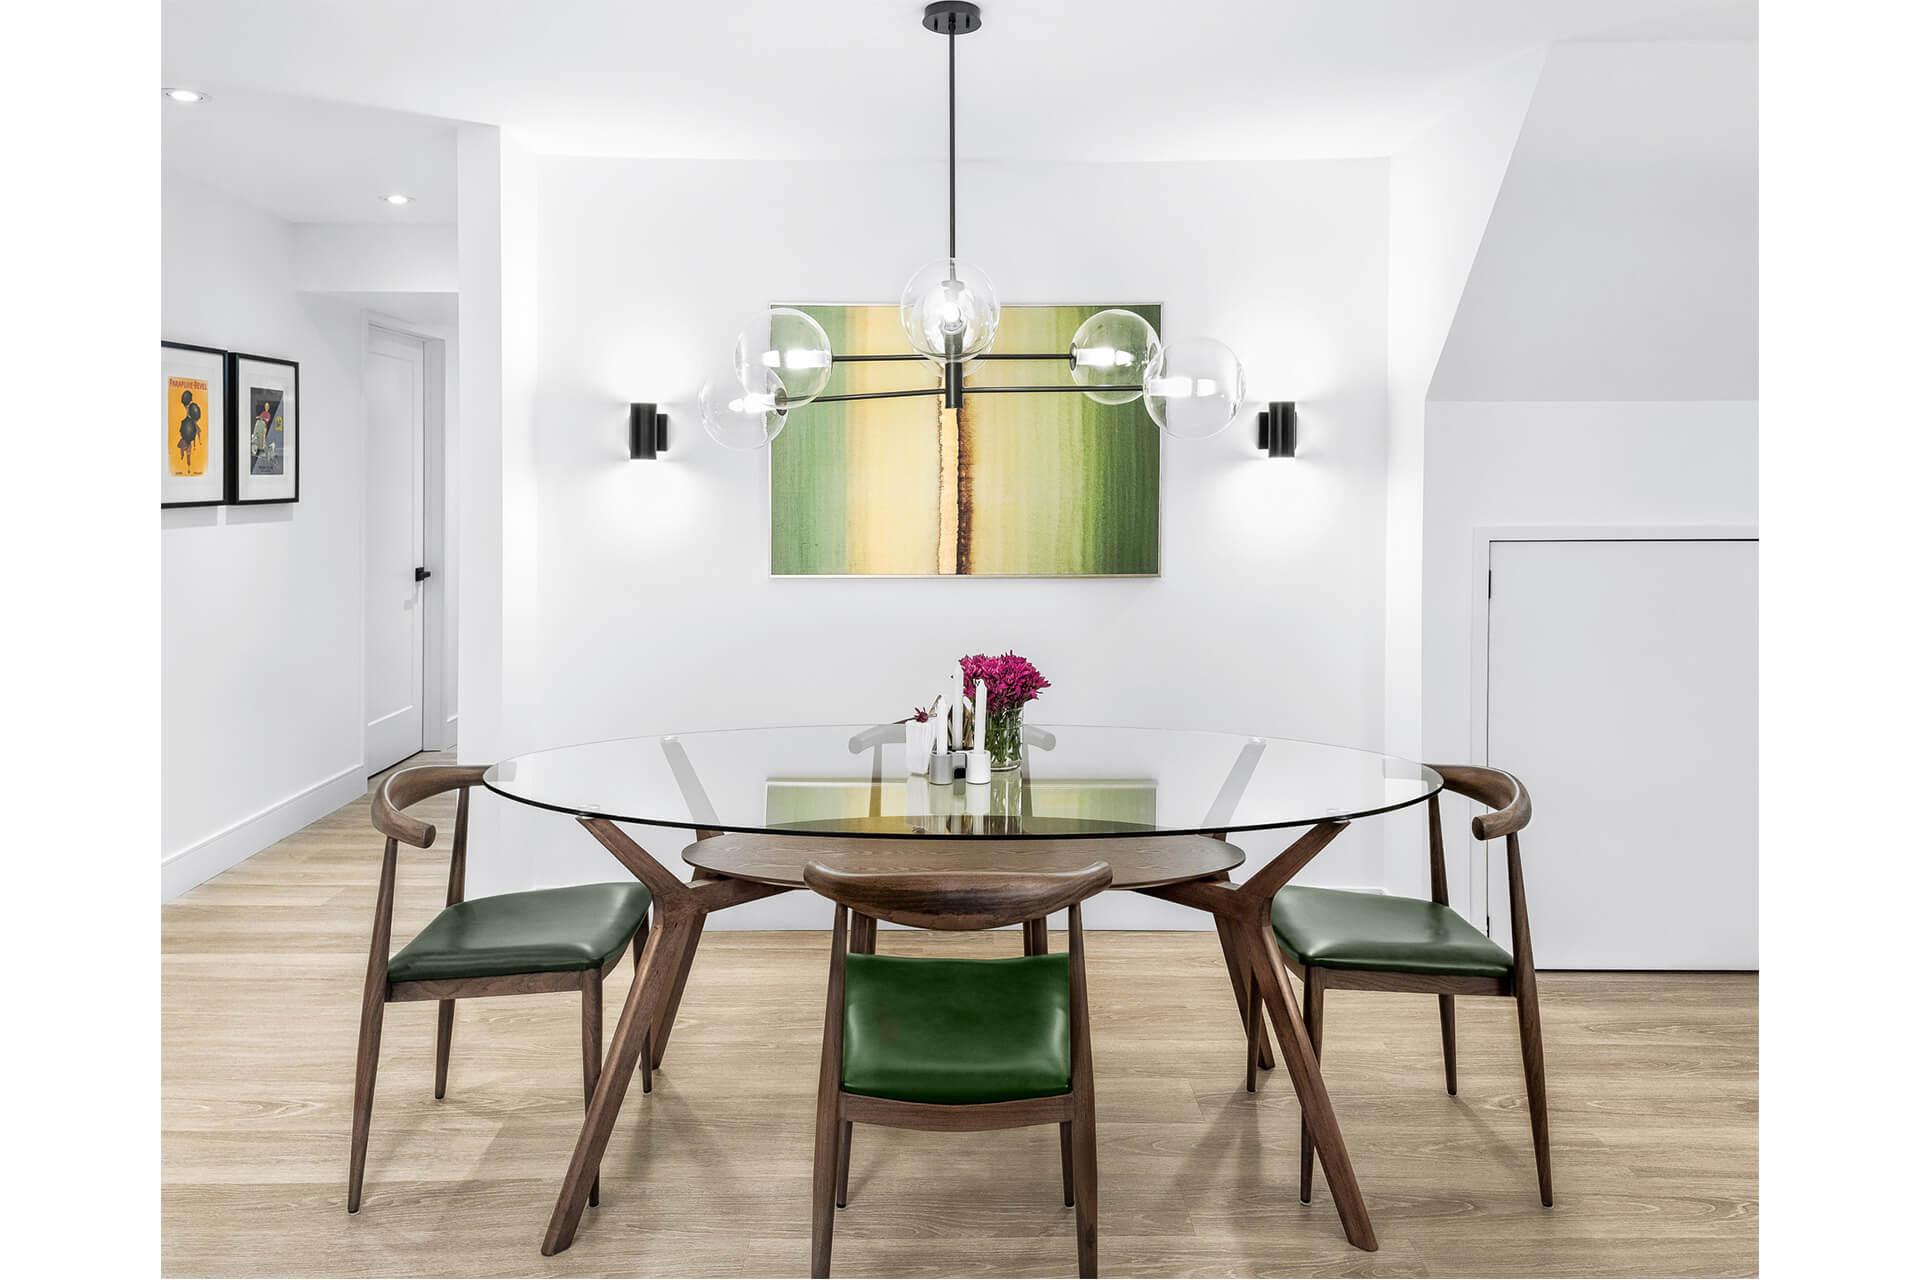 basement apartment, basement renovation, bright airy basement., couple/ millenial home, functional interiors, interiors, light warm interiors, scandinavian design, tropical green accents, vaughan